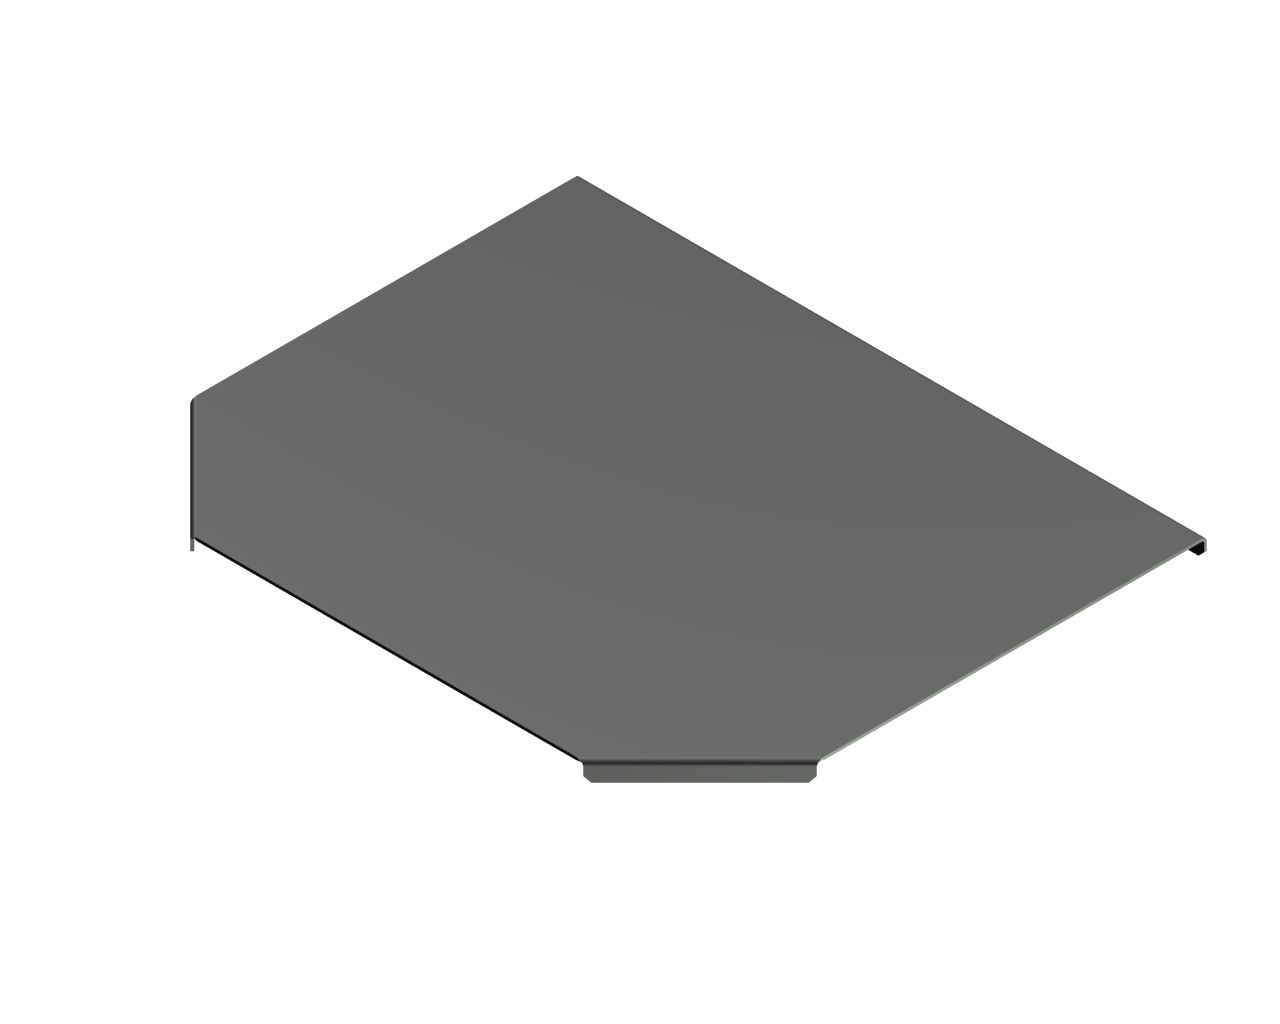 Pokrywa trójnika PTK